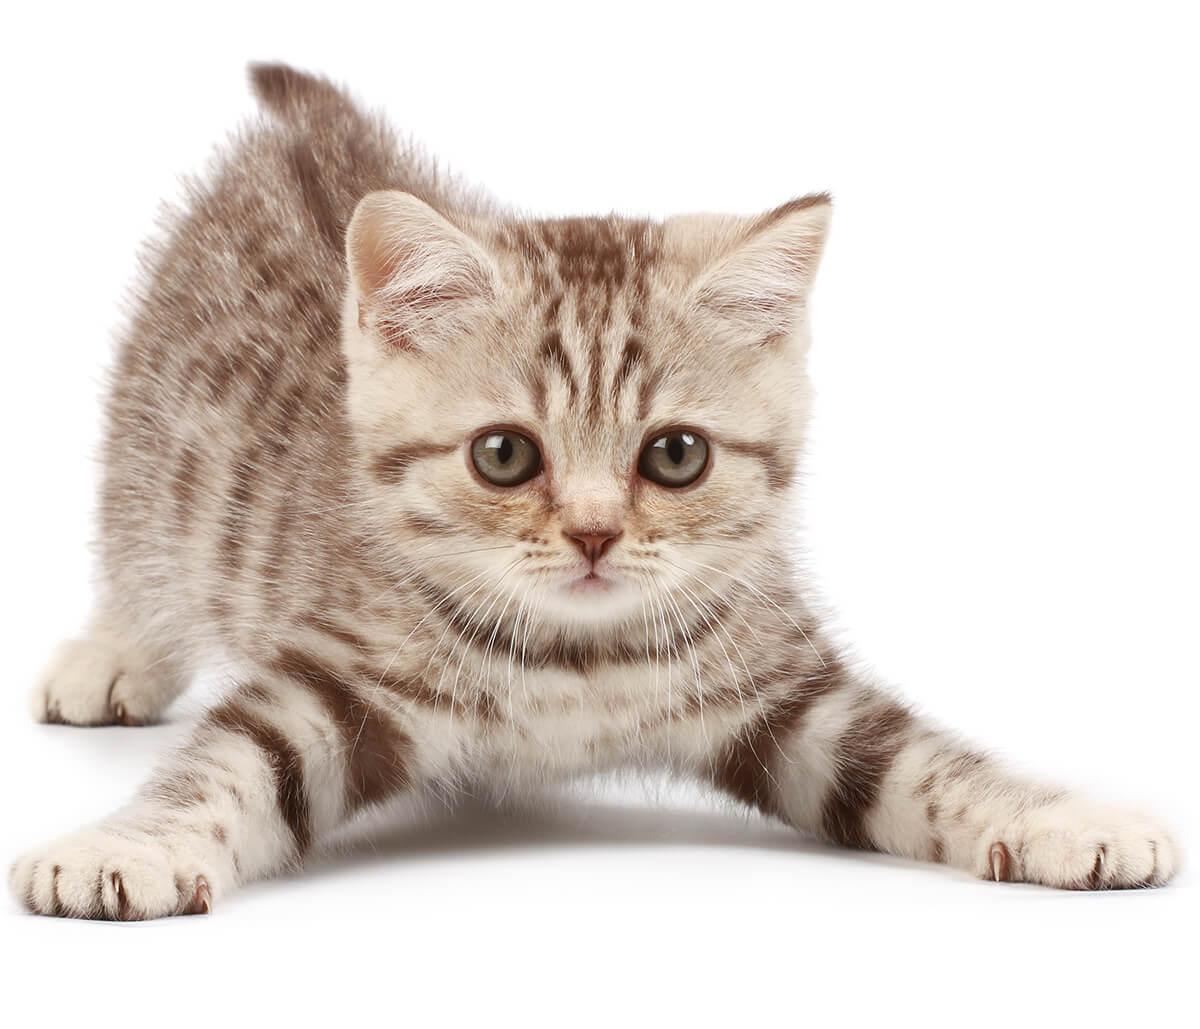 Kitten Health Issues in Jacksonville FL Area